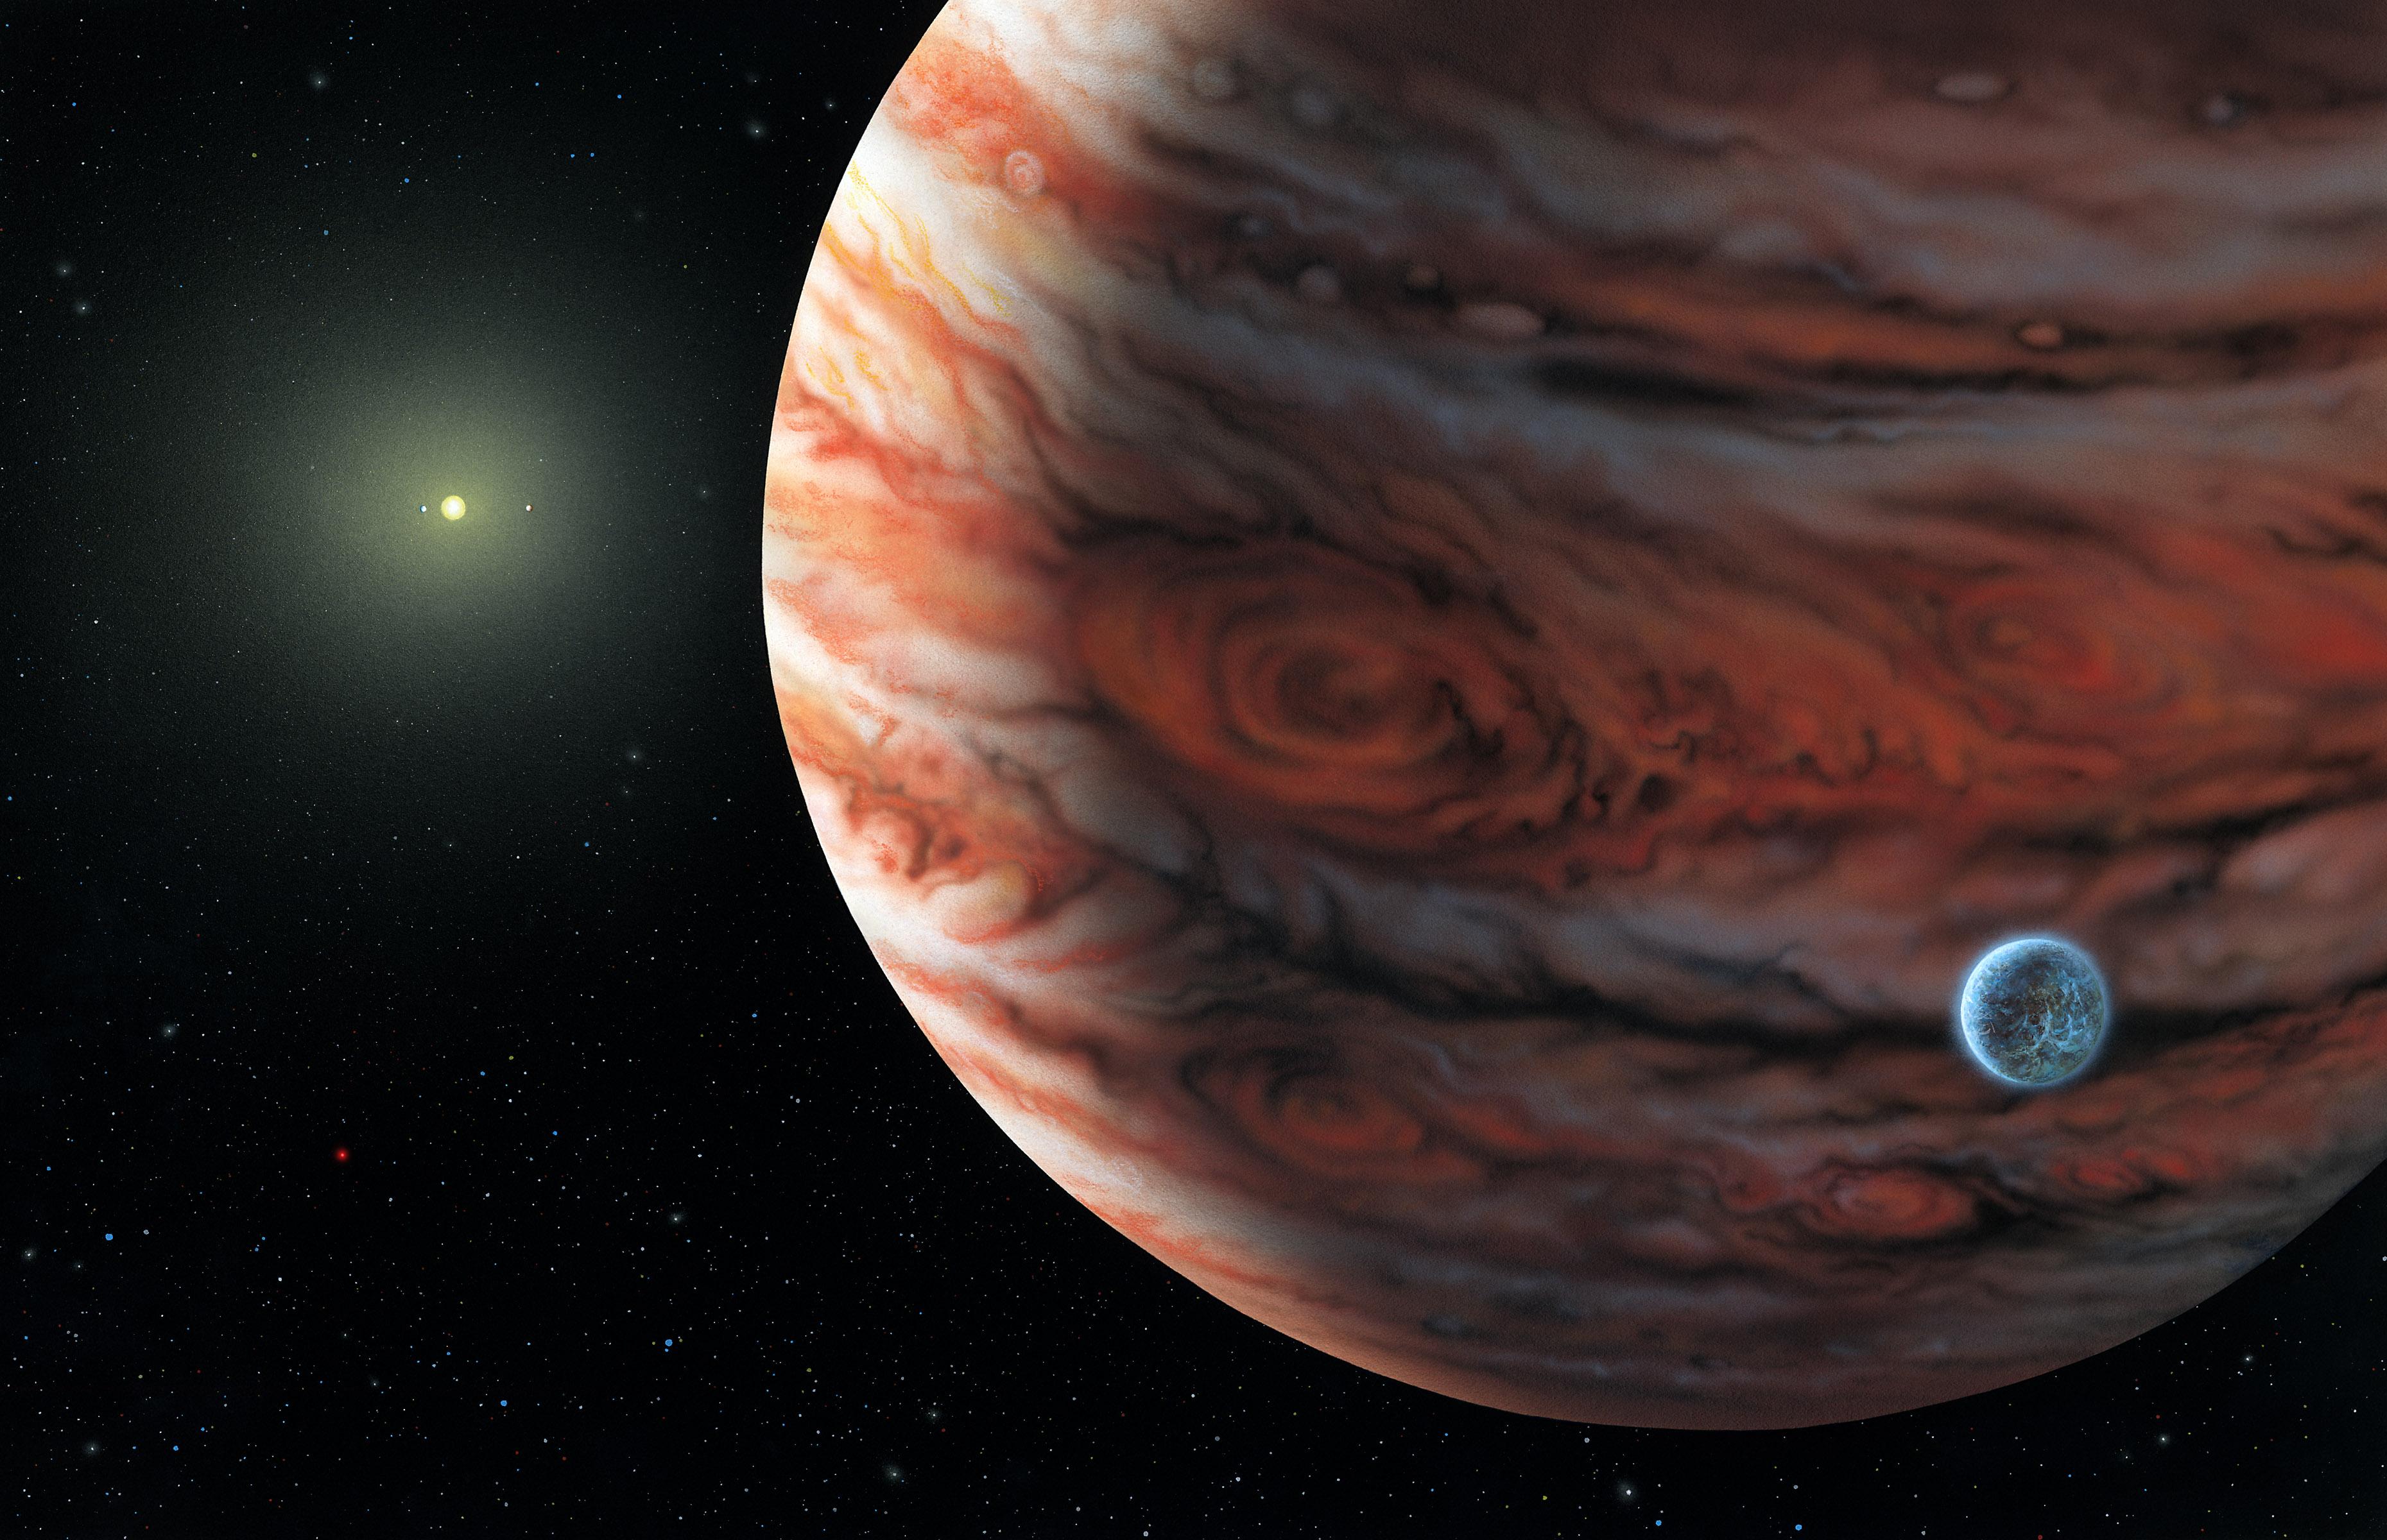 Mil planetas descubiertos en busca de nuevas Tierras Artist_s_impression_of_a_planetary_system_similar_to_our_own